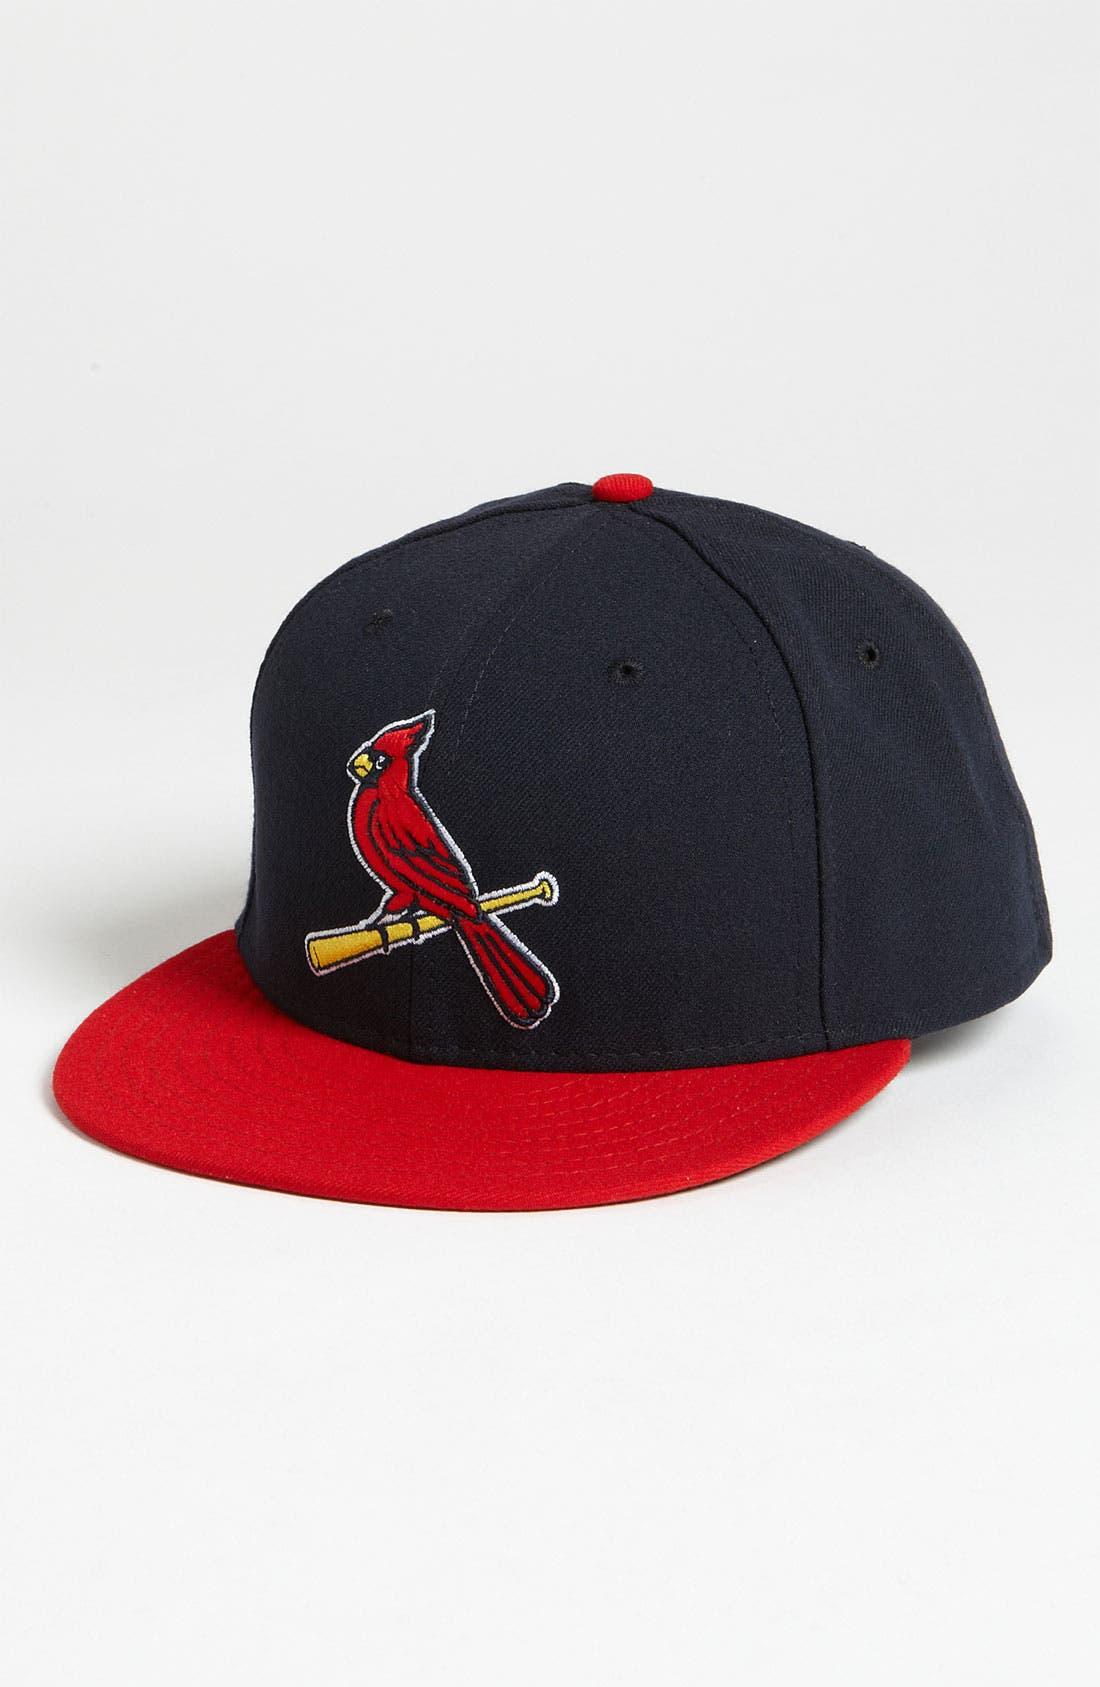 Alternate Image 1 Selected - New Era Cap 'St. Louis Cardinals' Baseball Cap